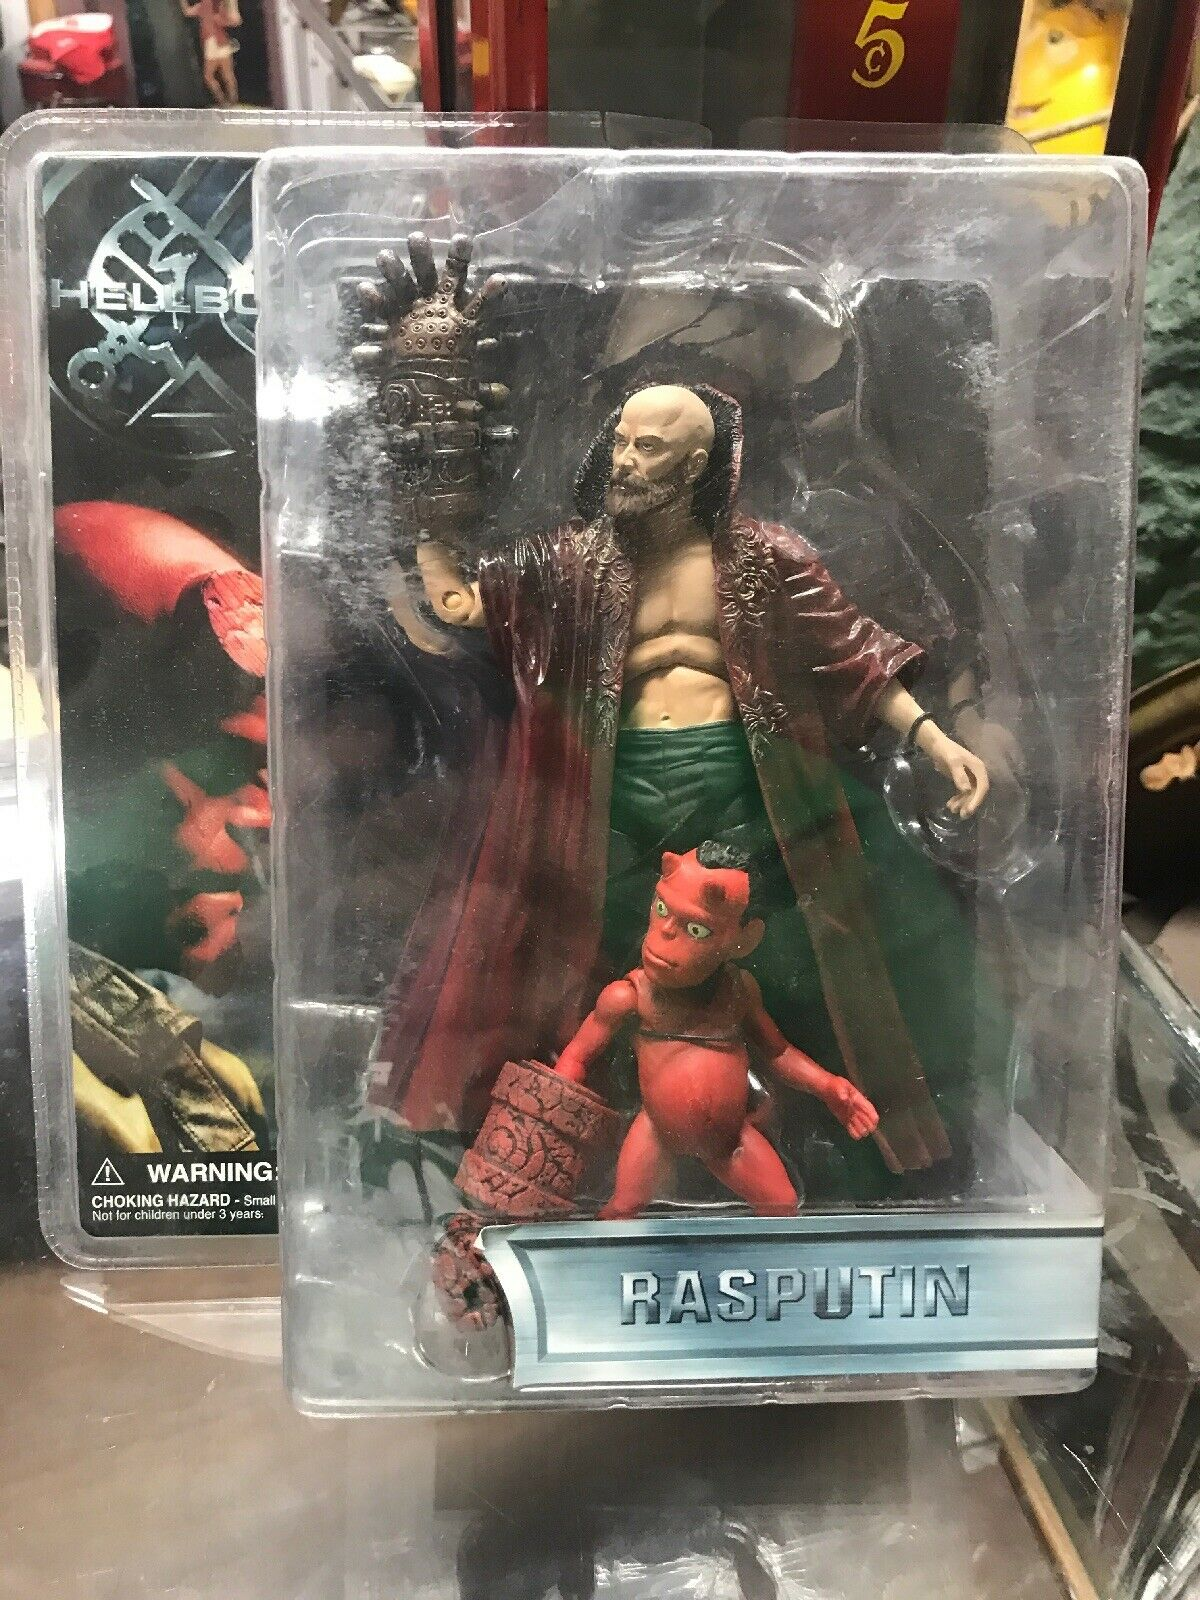 VTG mezco 2004 2004 2004 HELLBOY Rasputin 8  action figure w Little Devil Boy SEALED 6b1307